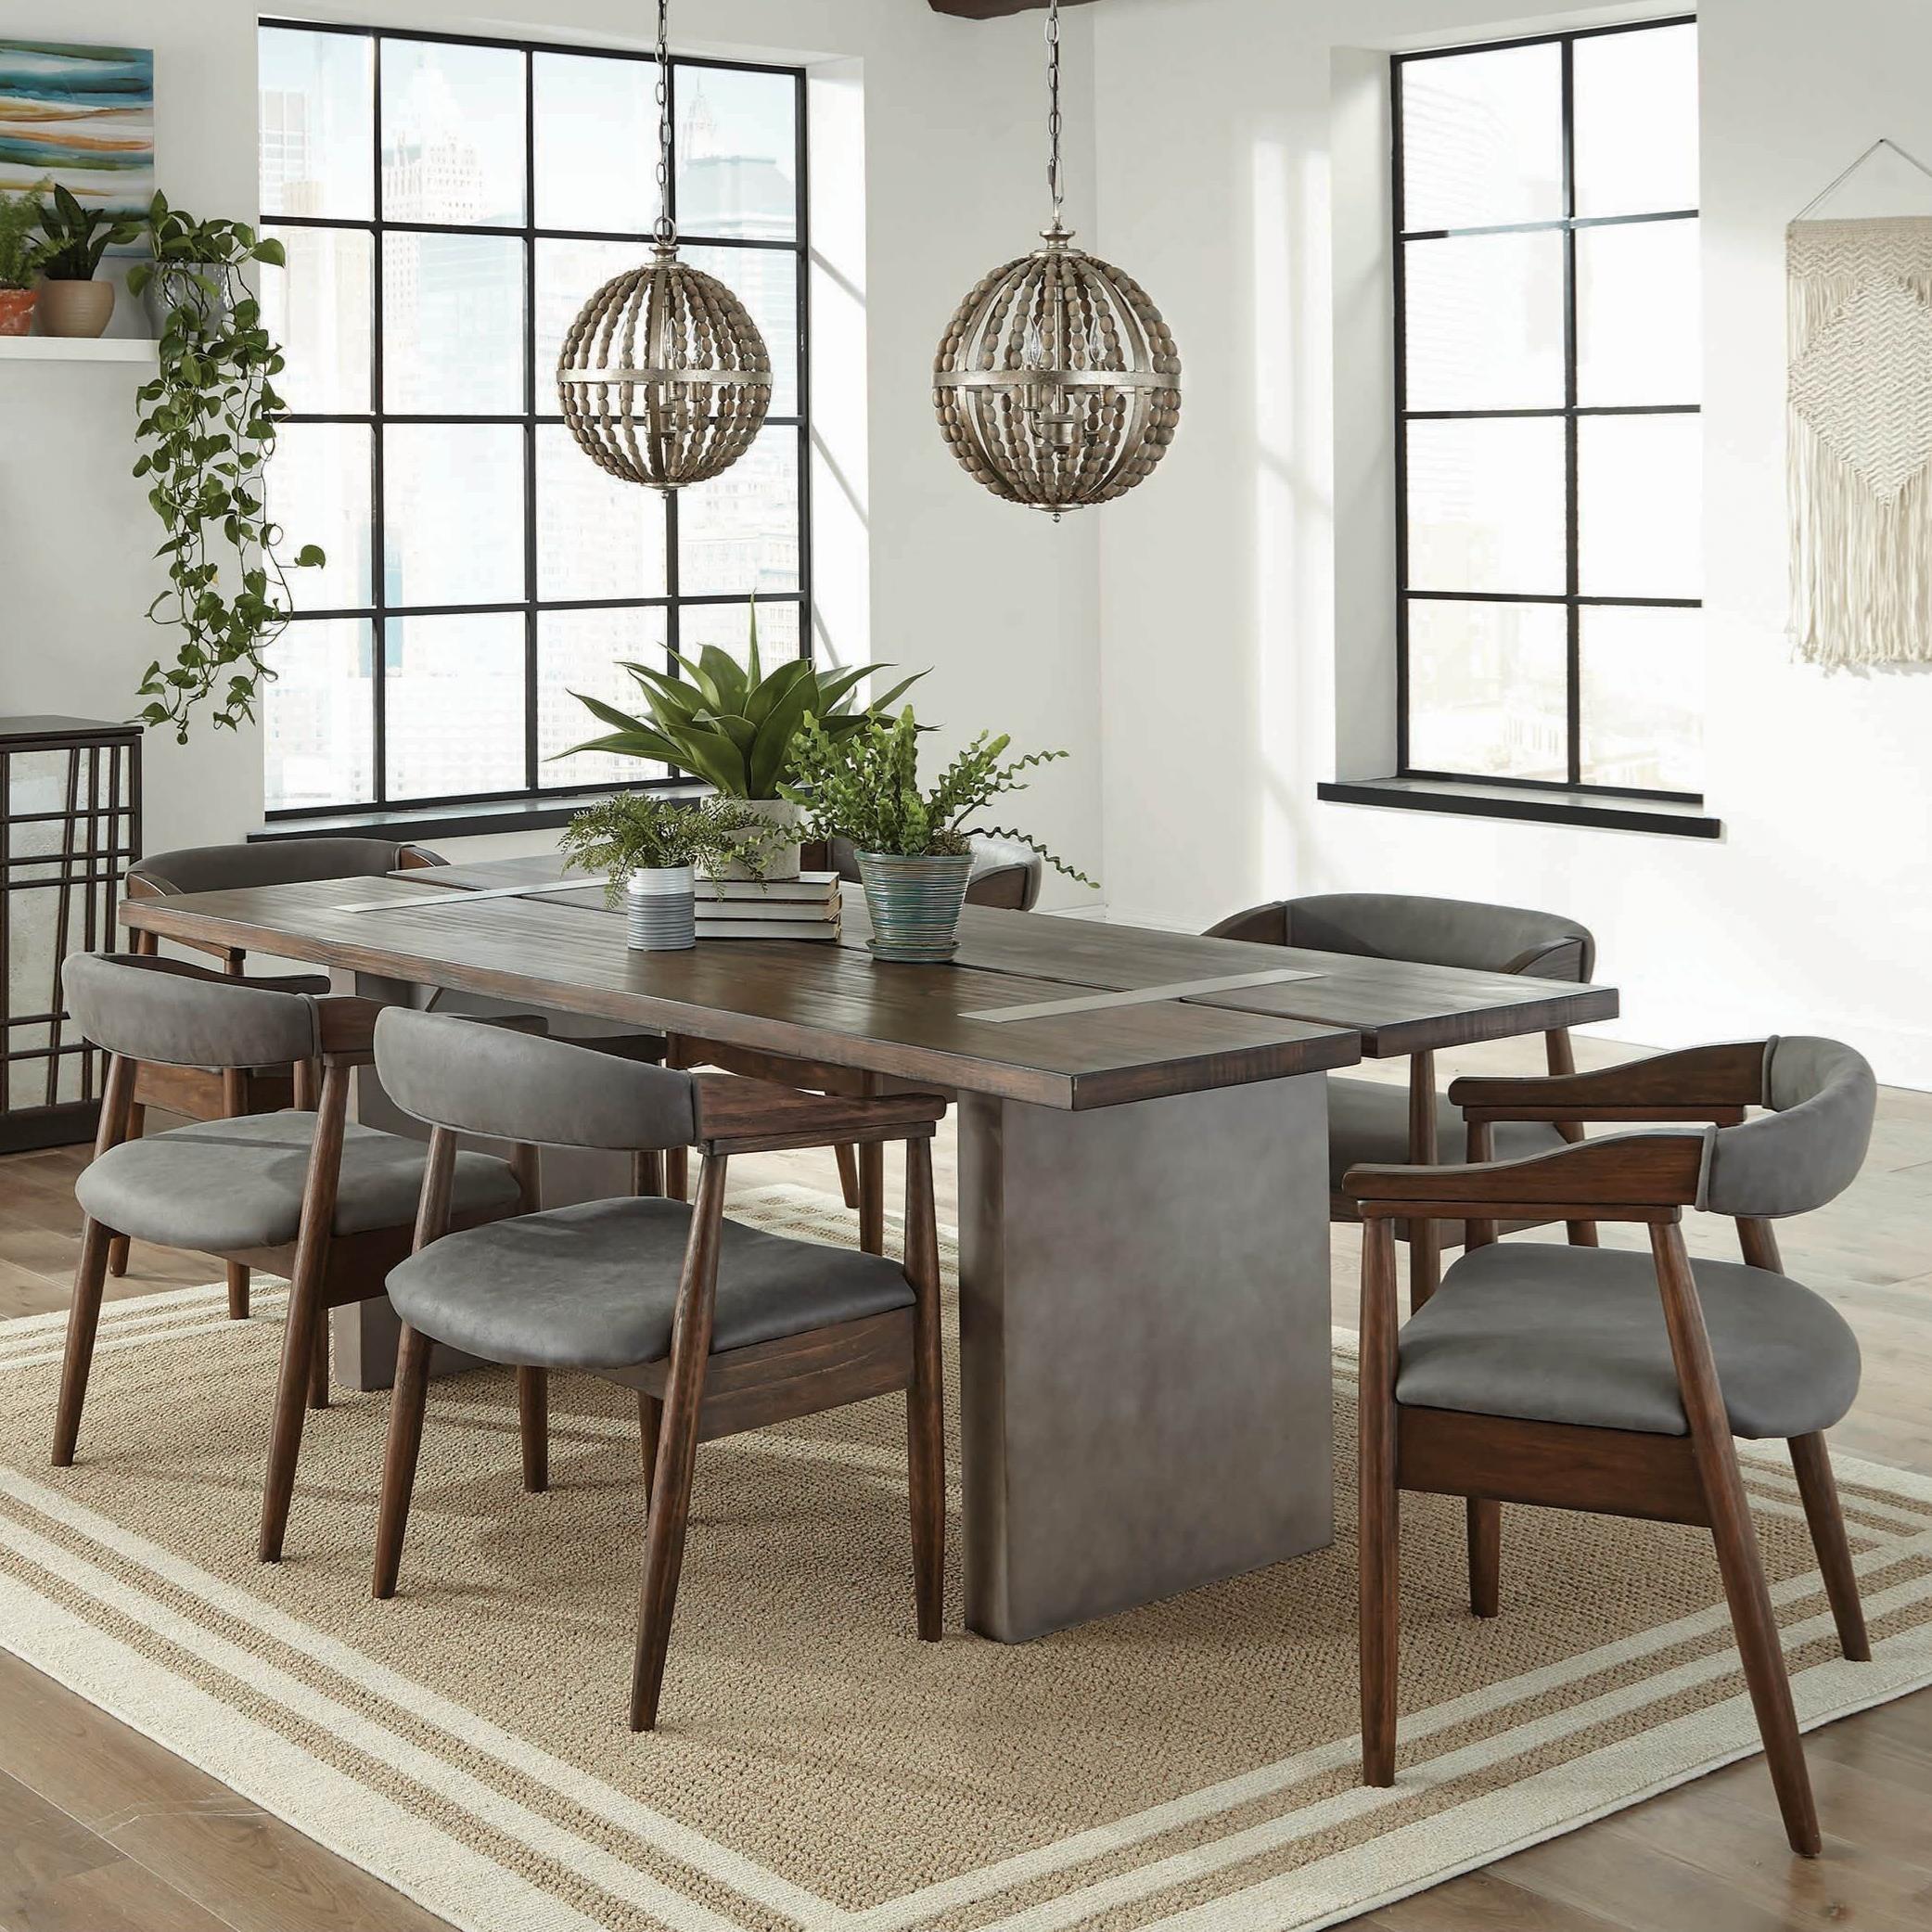 Lapeer Furniture U0026 Mattress Center